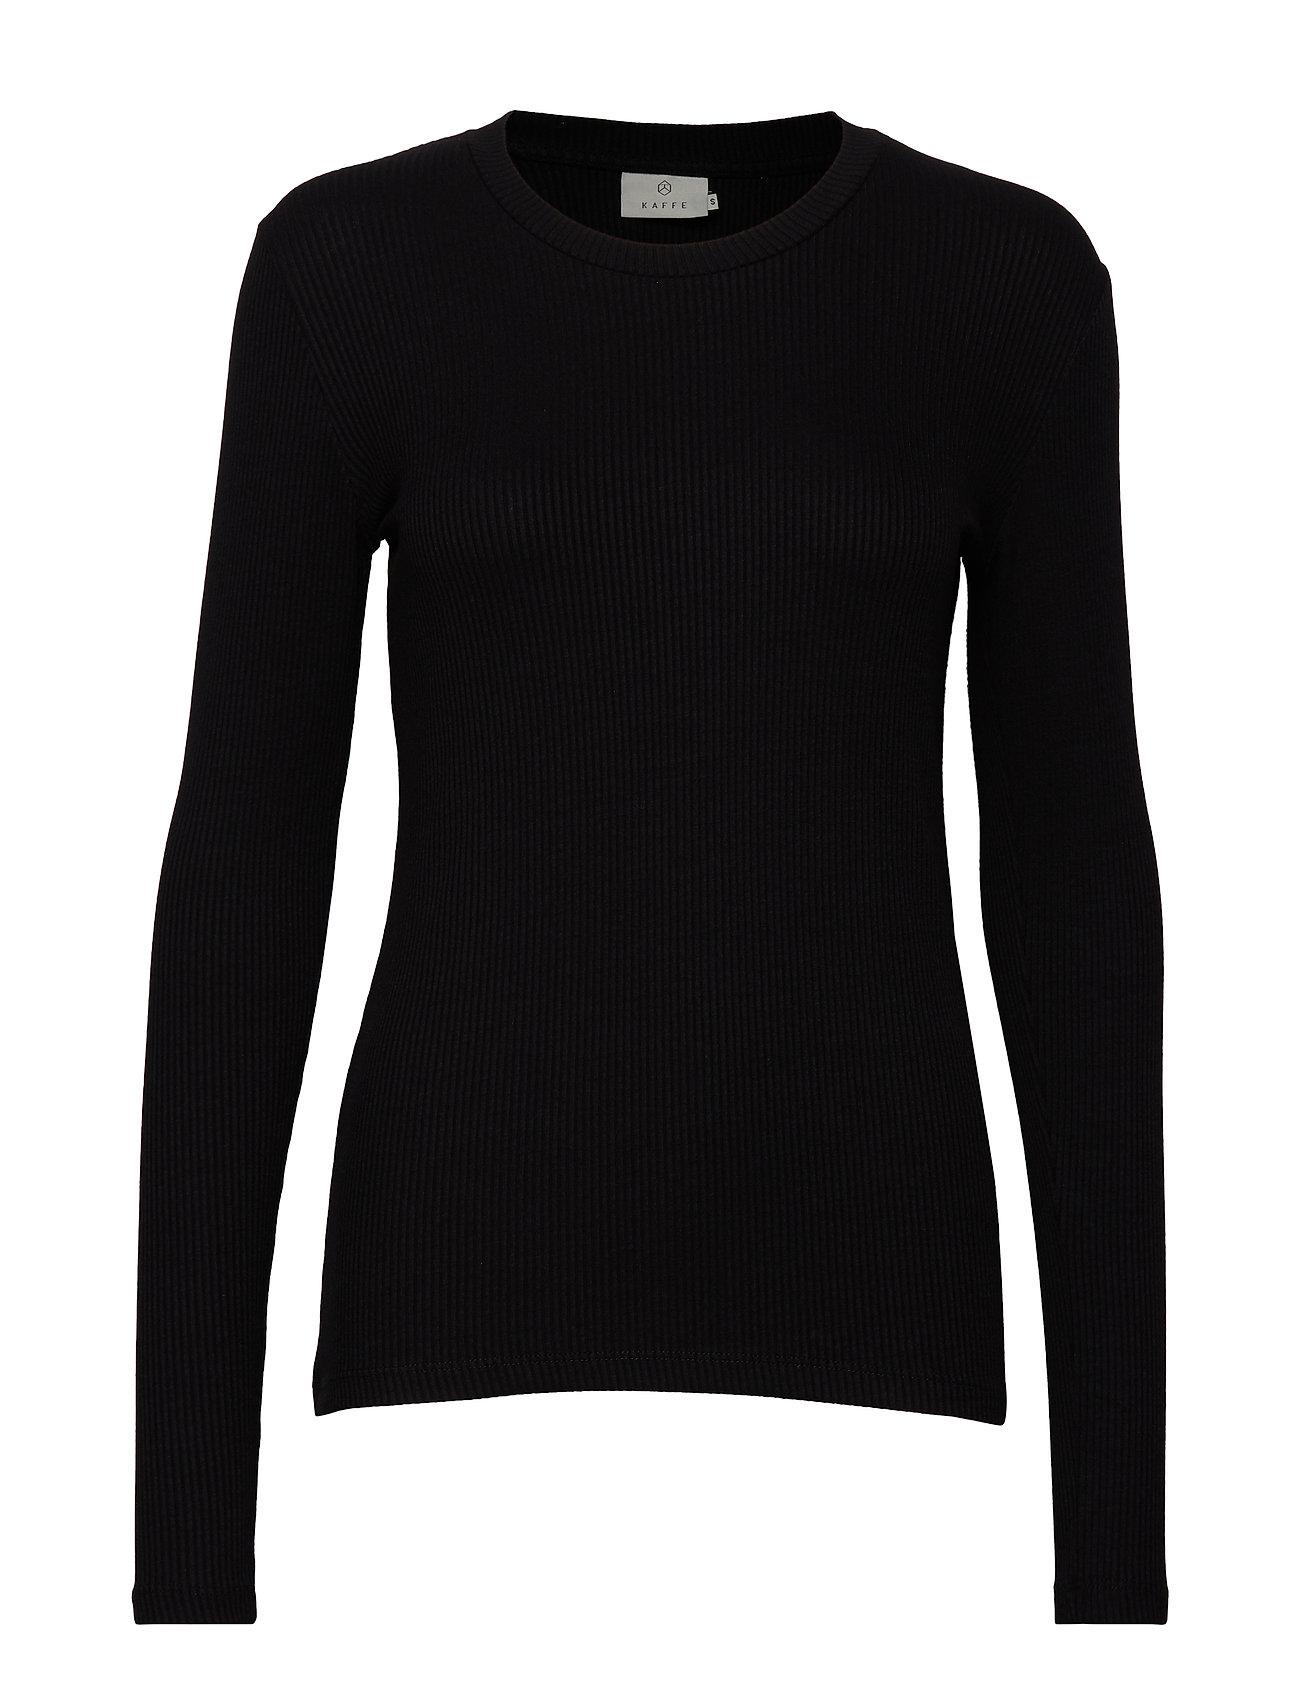 Kaffe KAlia Long Sleeve T-shirt - BLACK DEEP